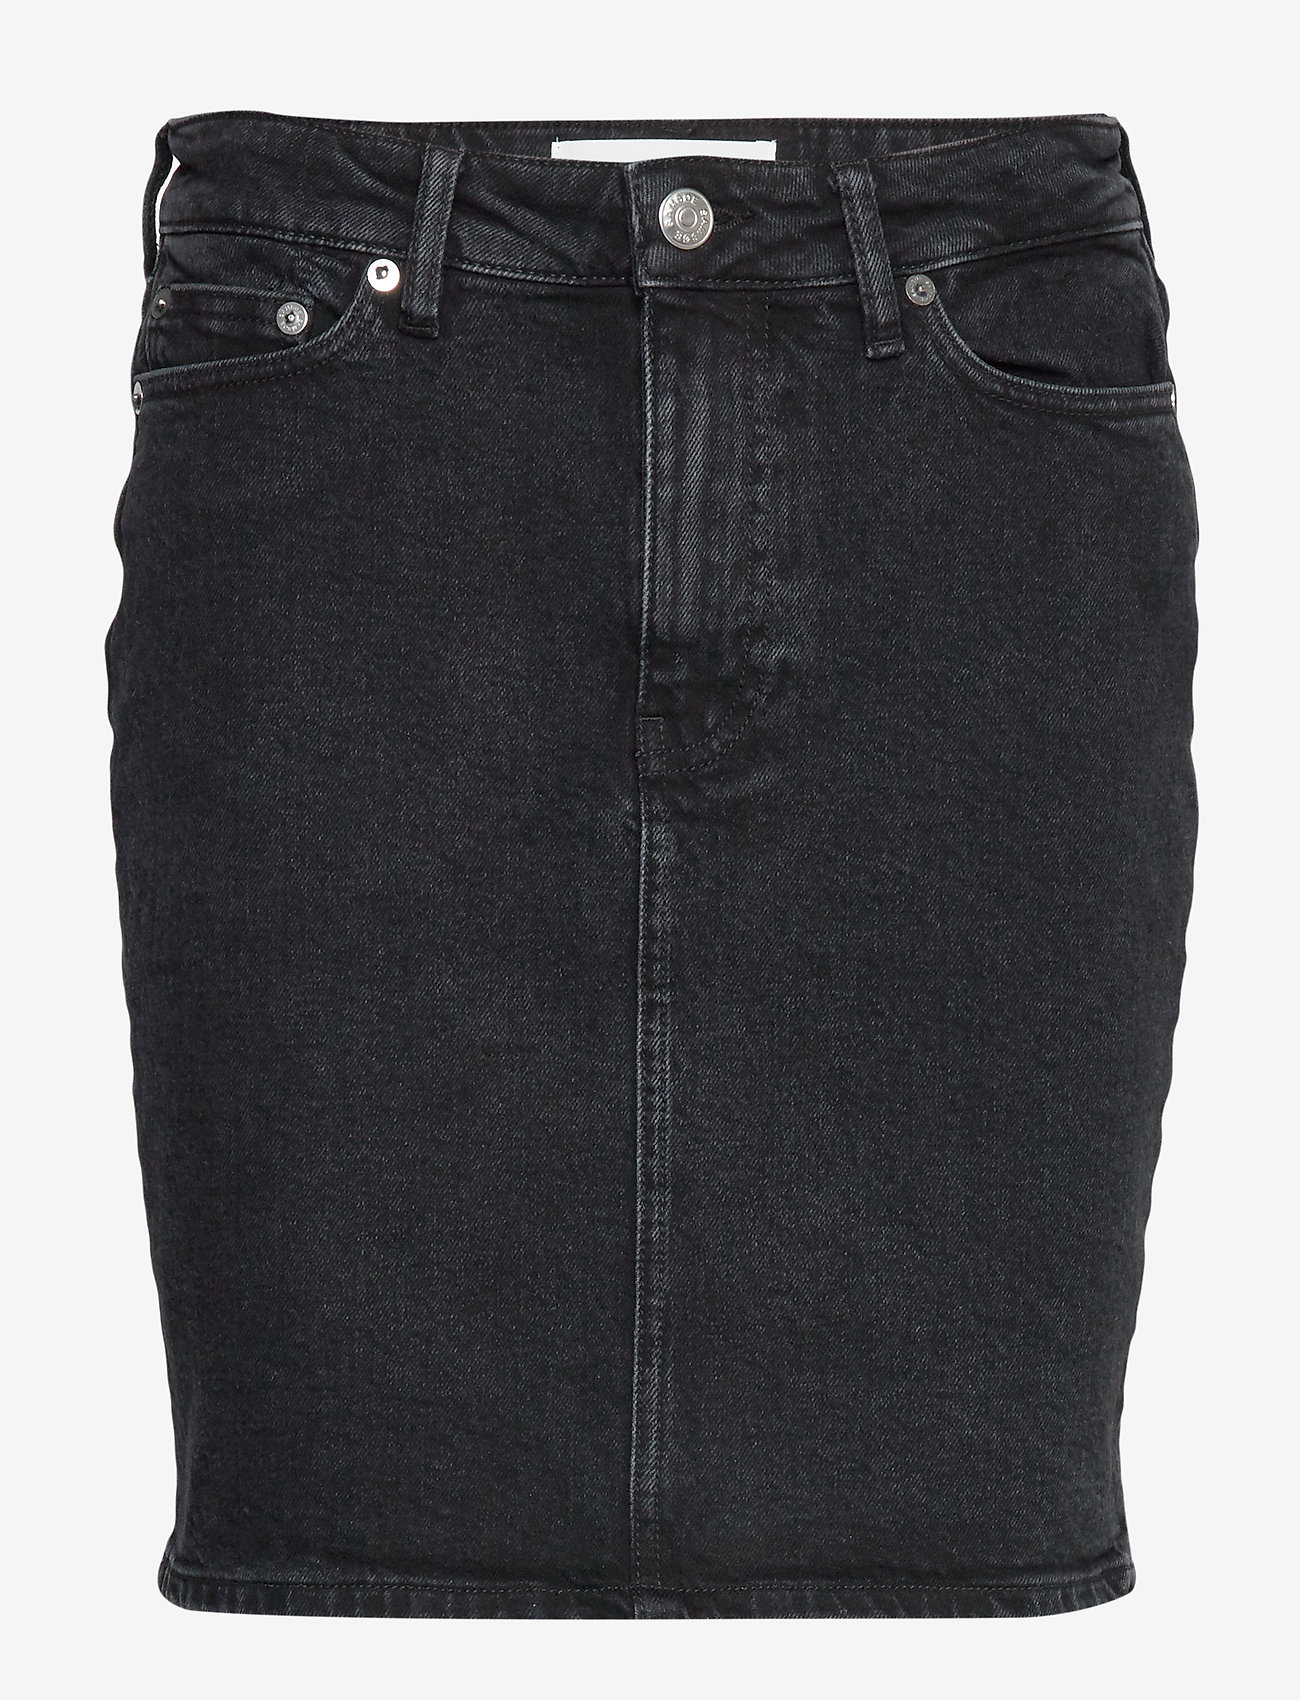 Samsøe Samsøe - Pamela skirt 11356 - jeansowe spódnice - black rock - 0